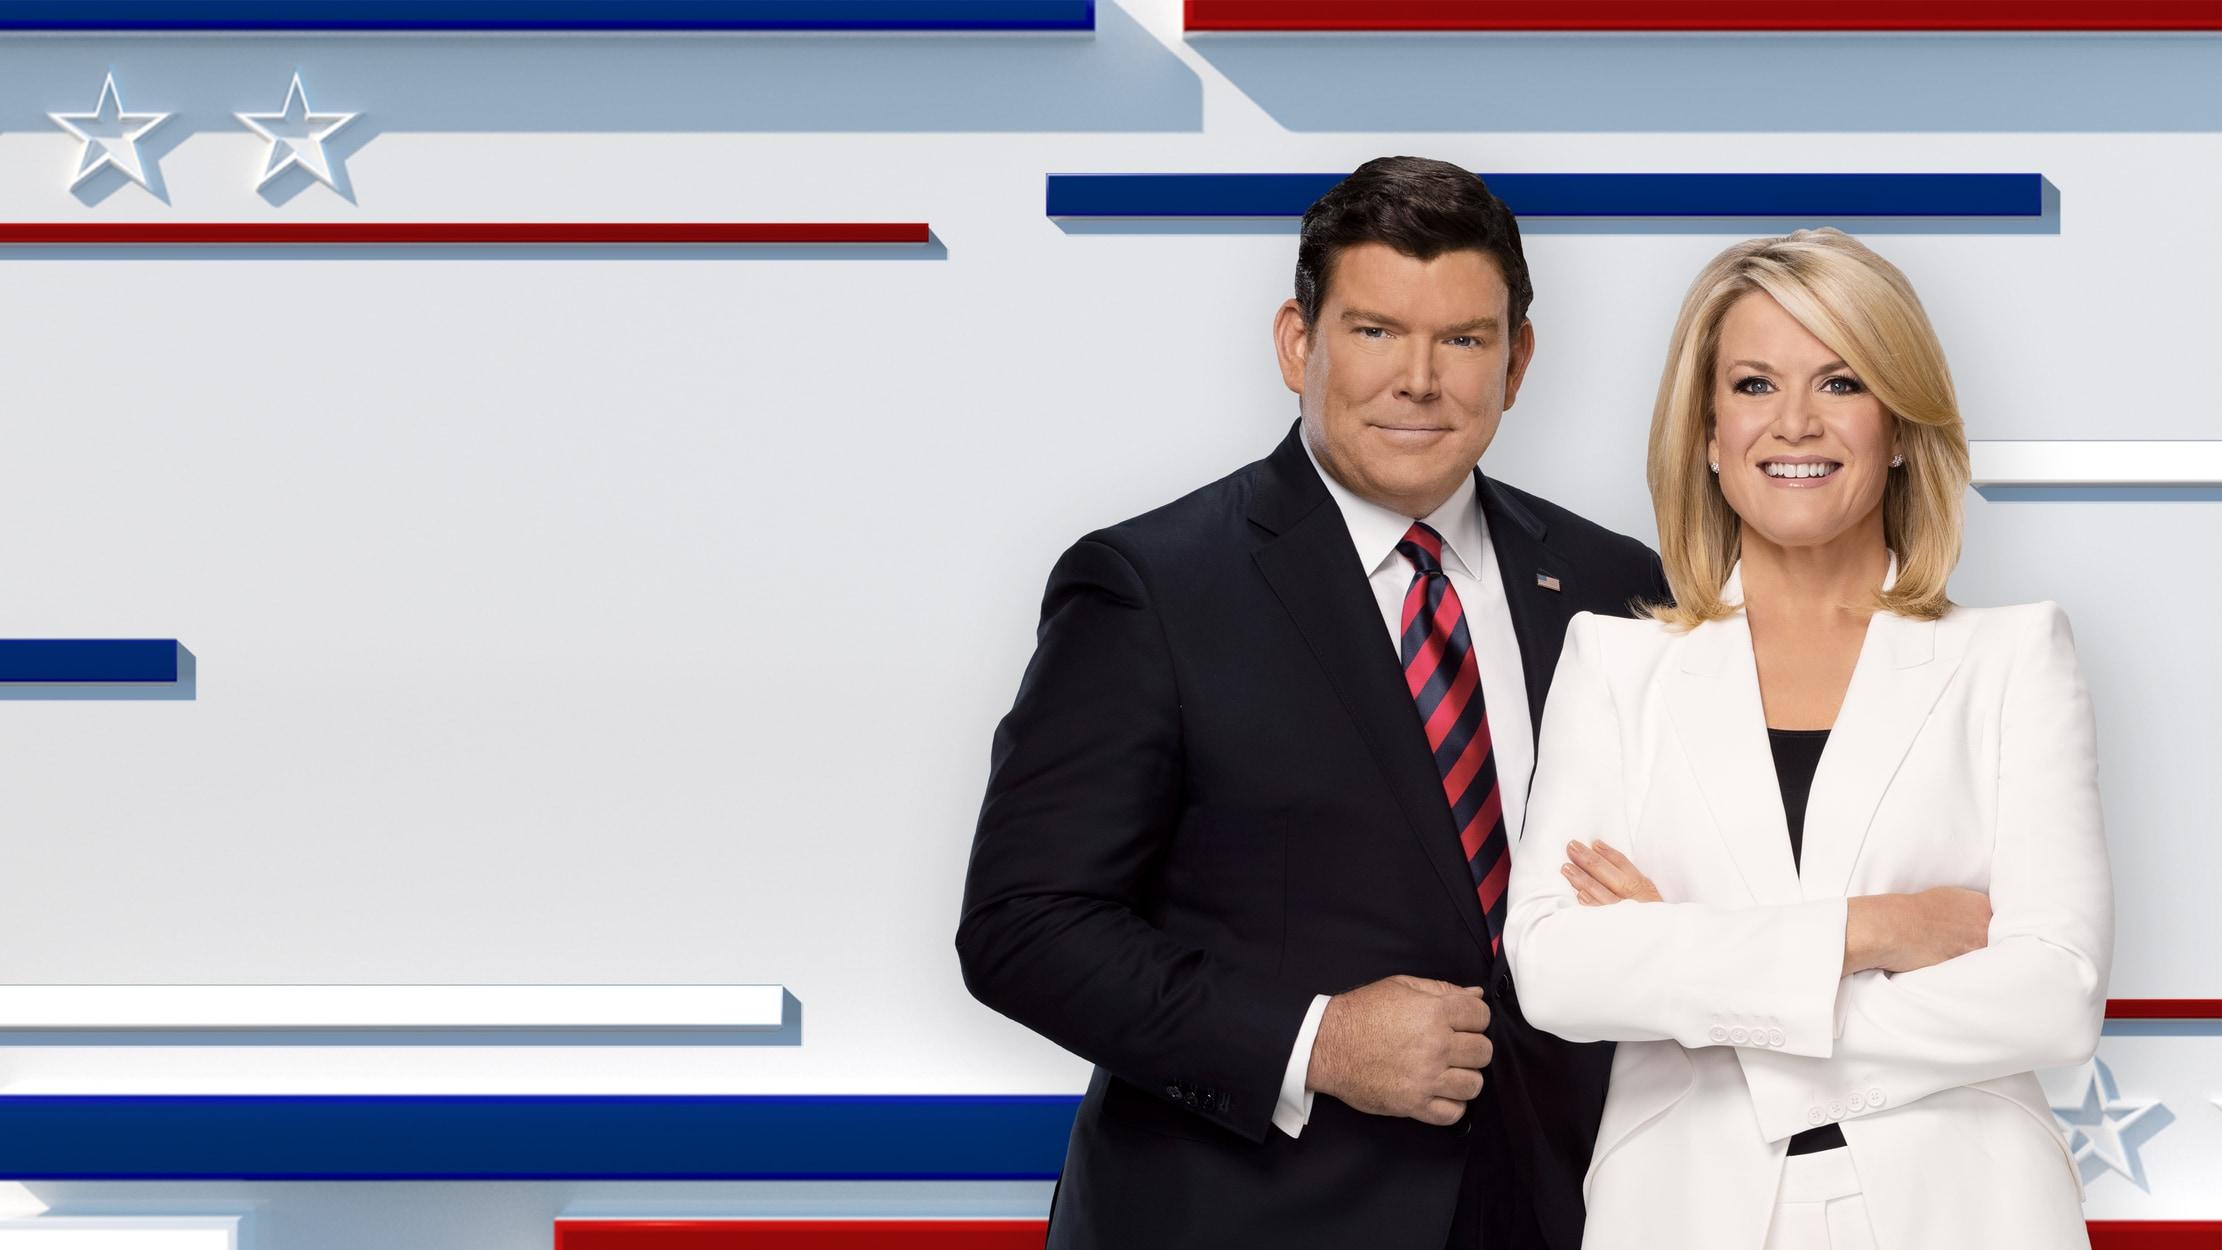 Fox News Democracy 2020: Convention Kickoff